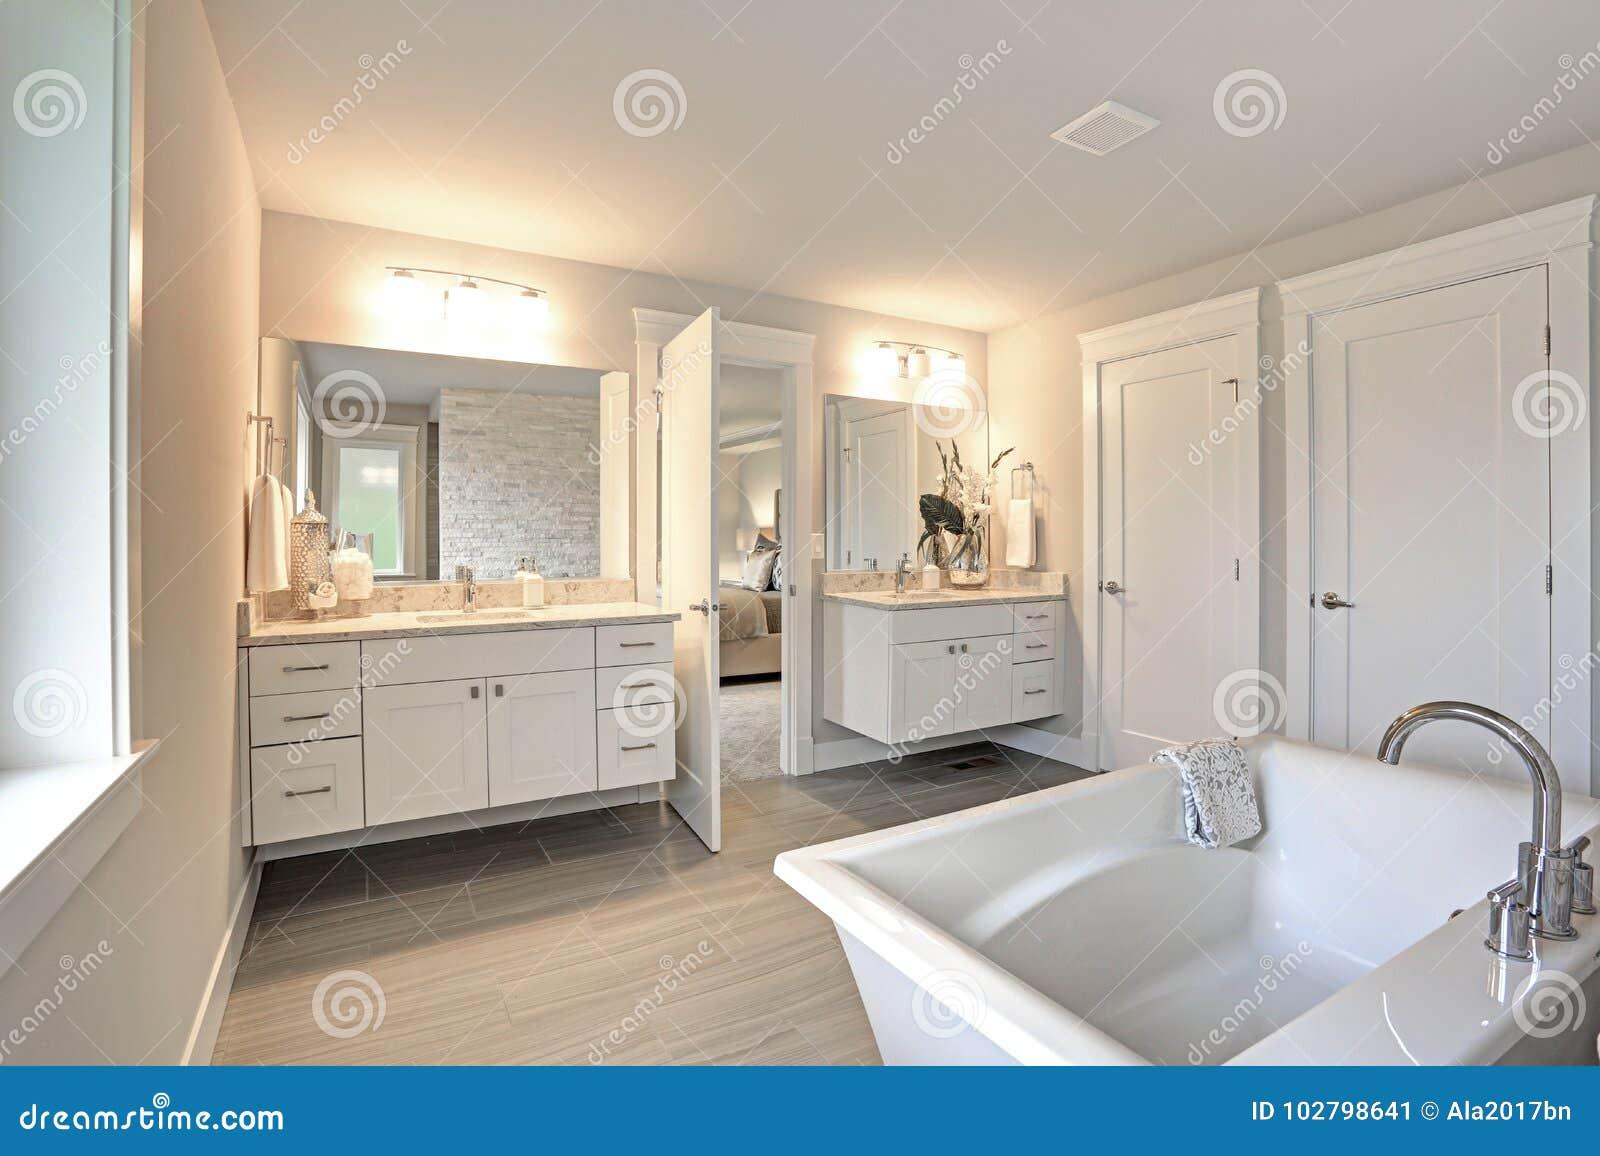 Amazing Master Bathroom With Two Bathroom Vanities Stock Image Image Of Architect Apartment 102798641